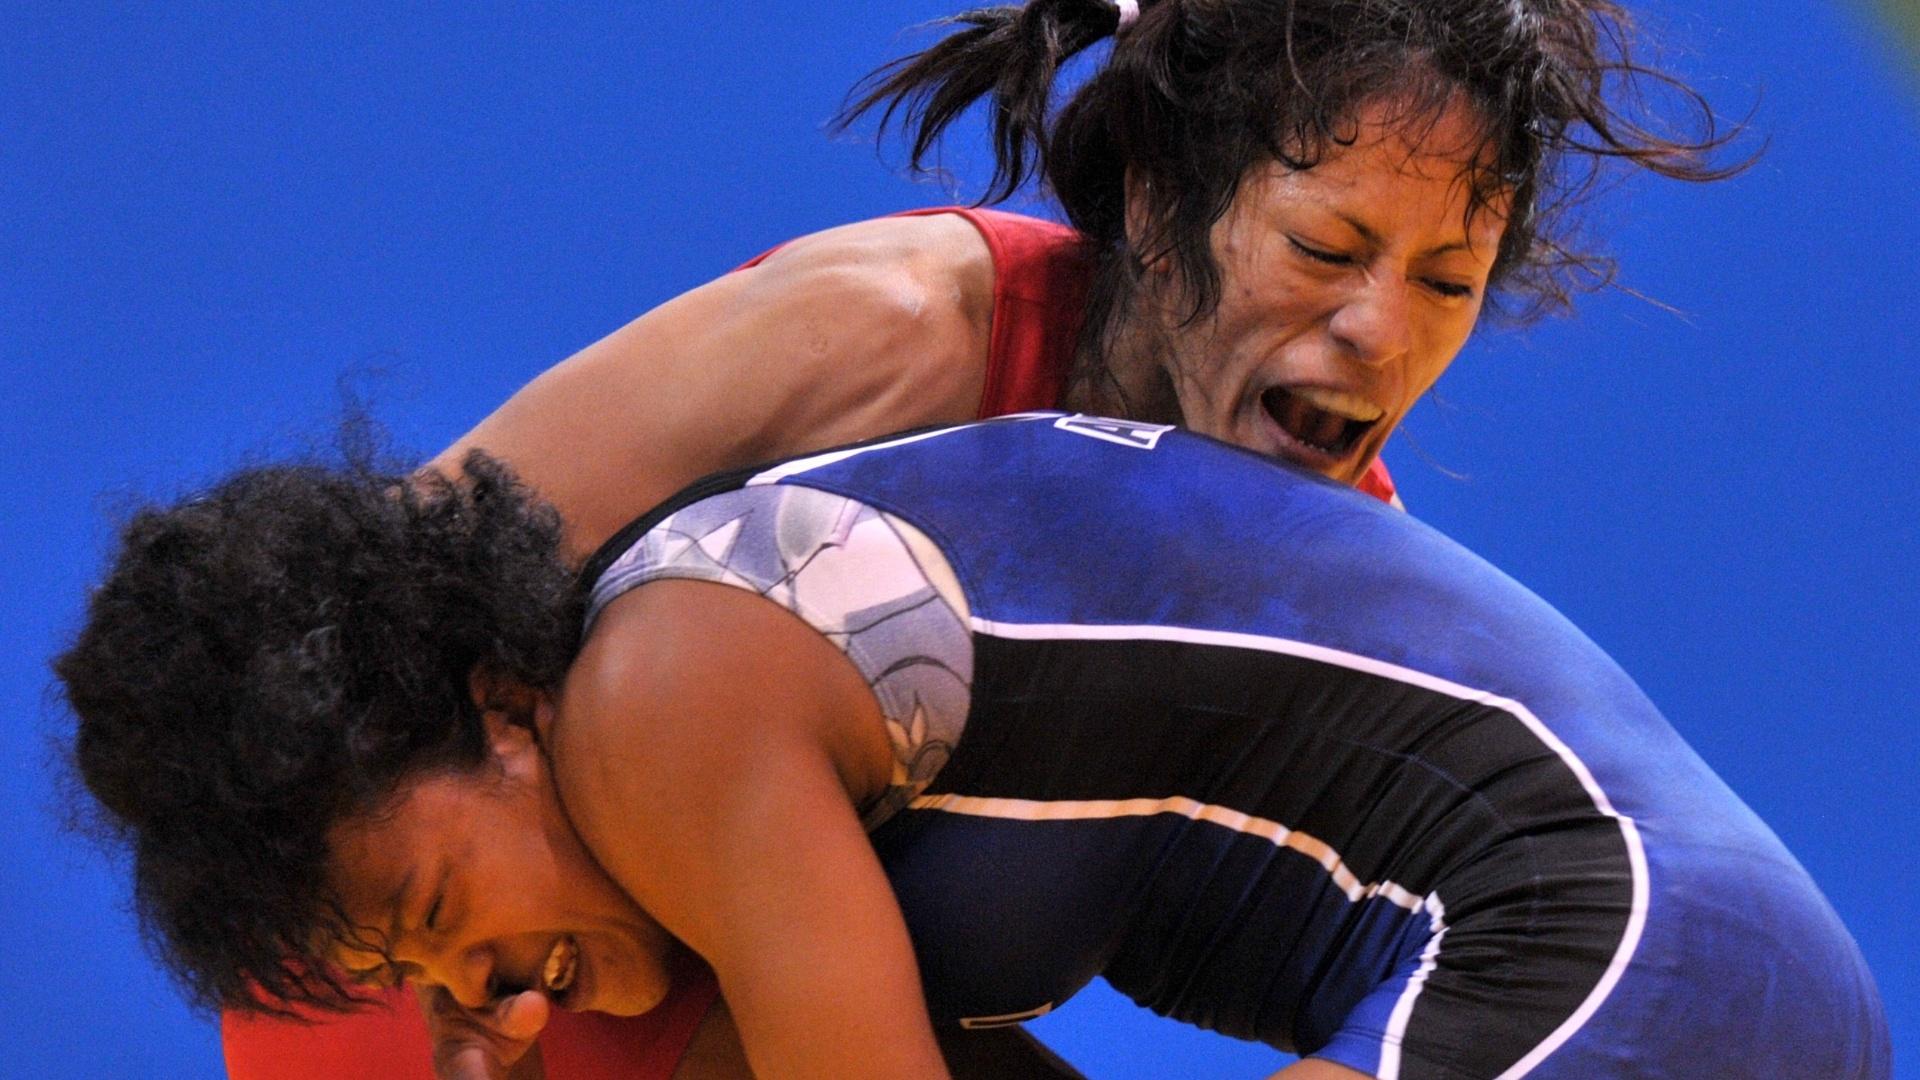 Lissette Antes e Jenny Mallqui se degladiam durante combate de luta olímpica no Pan de Guadalajara